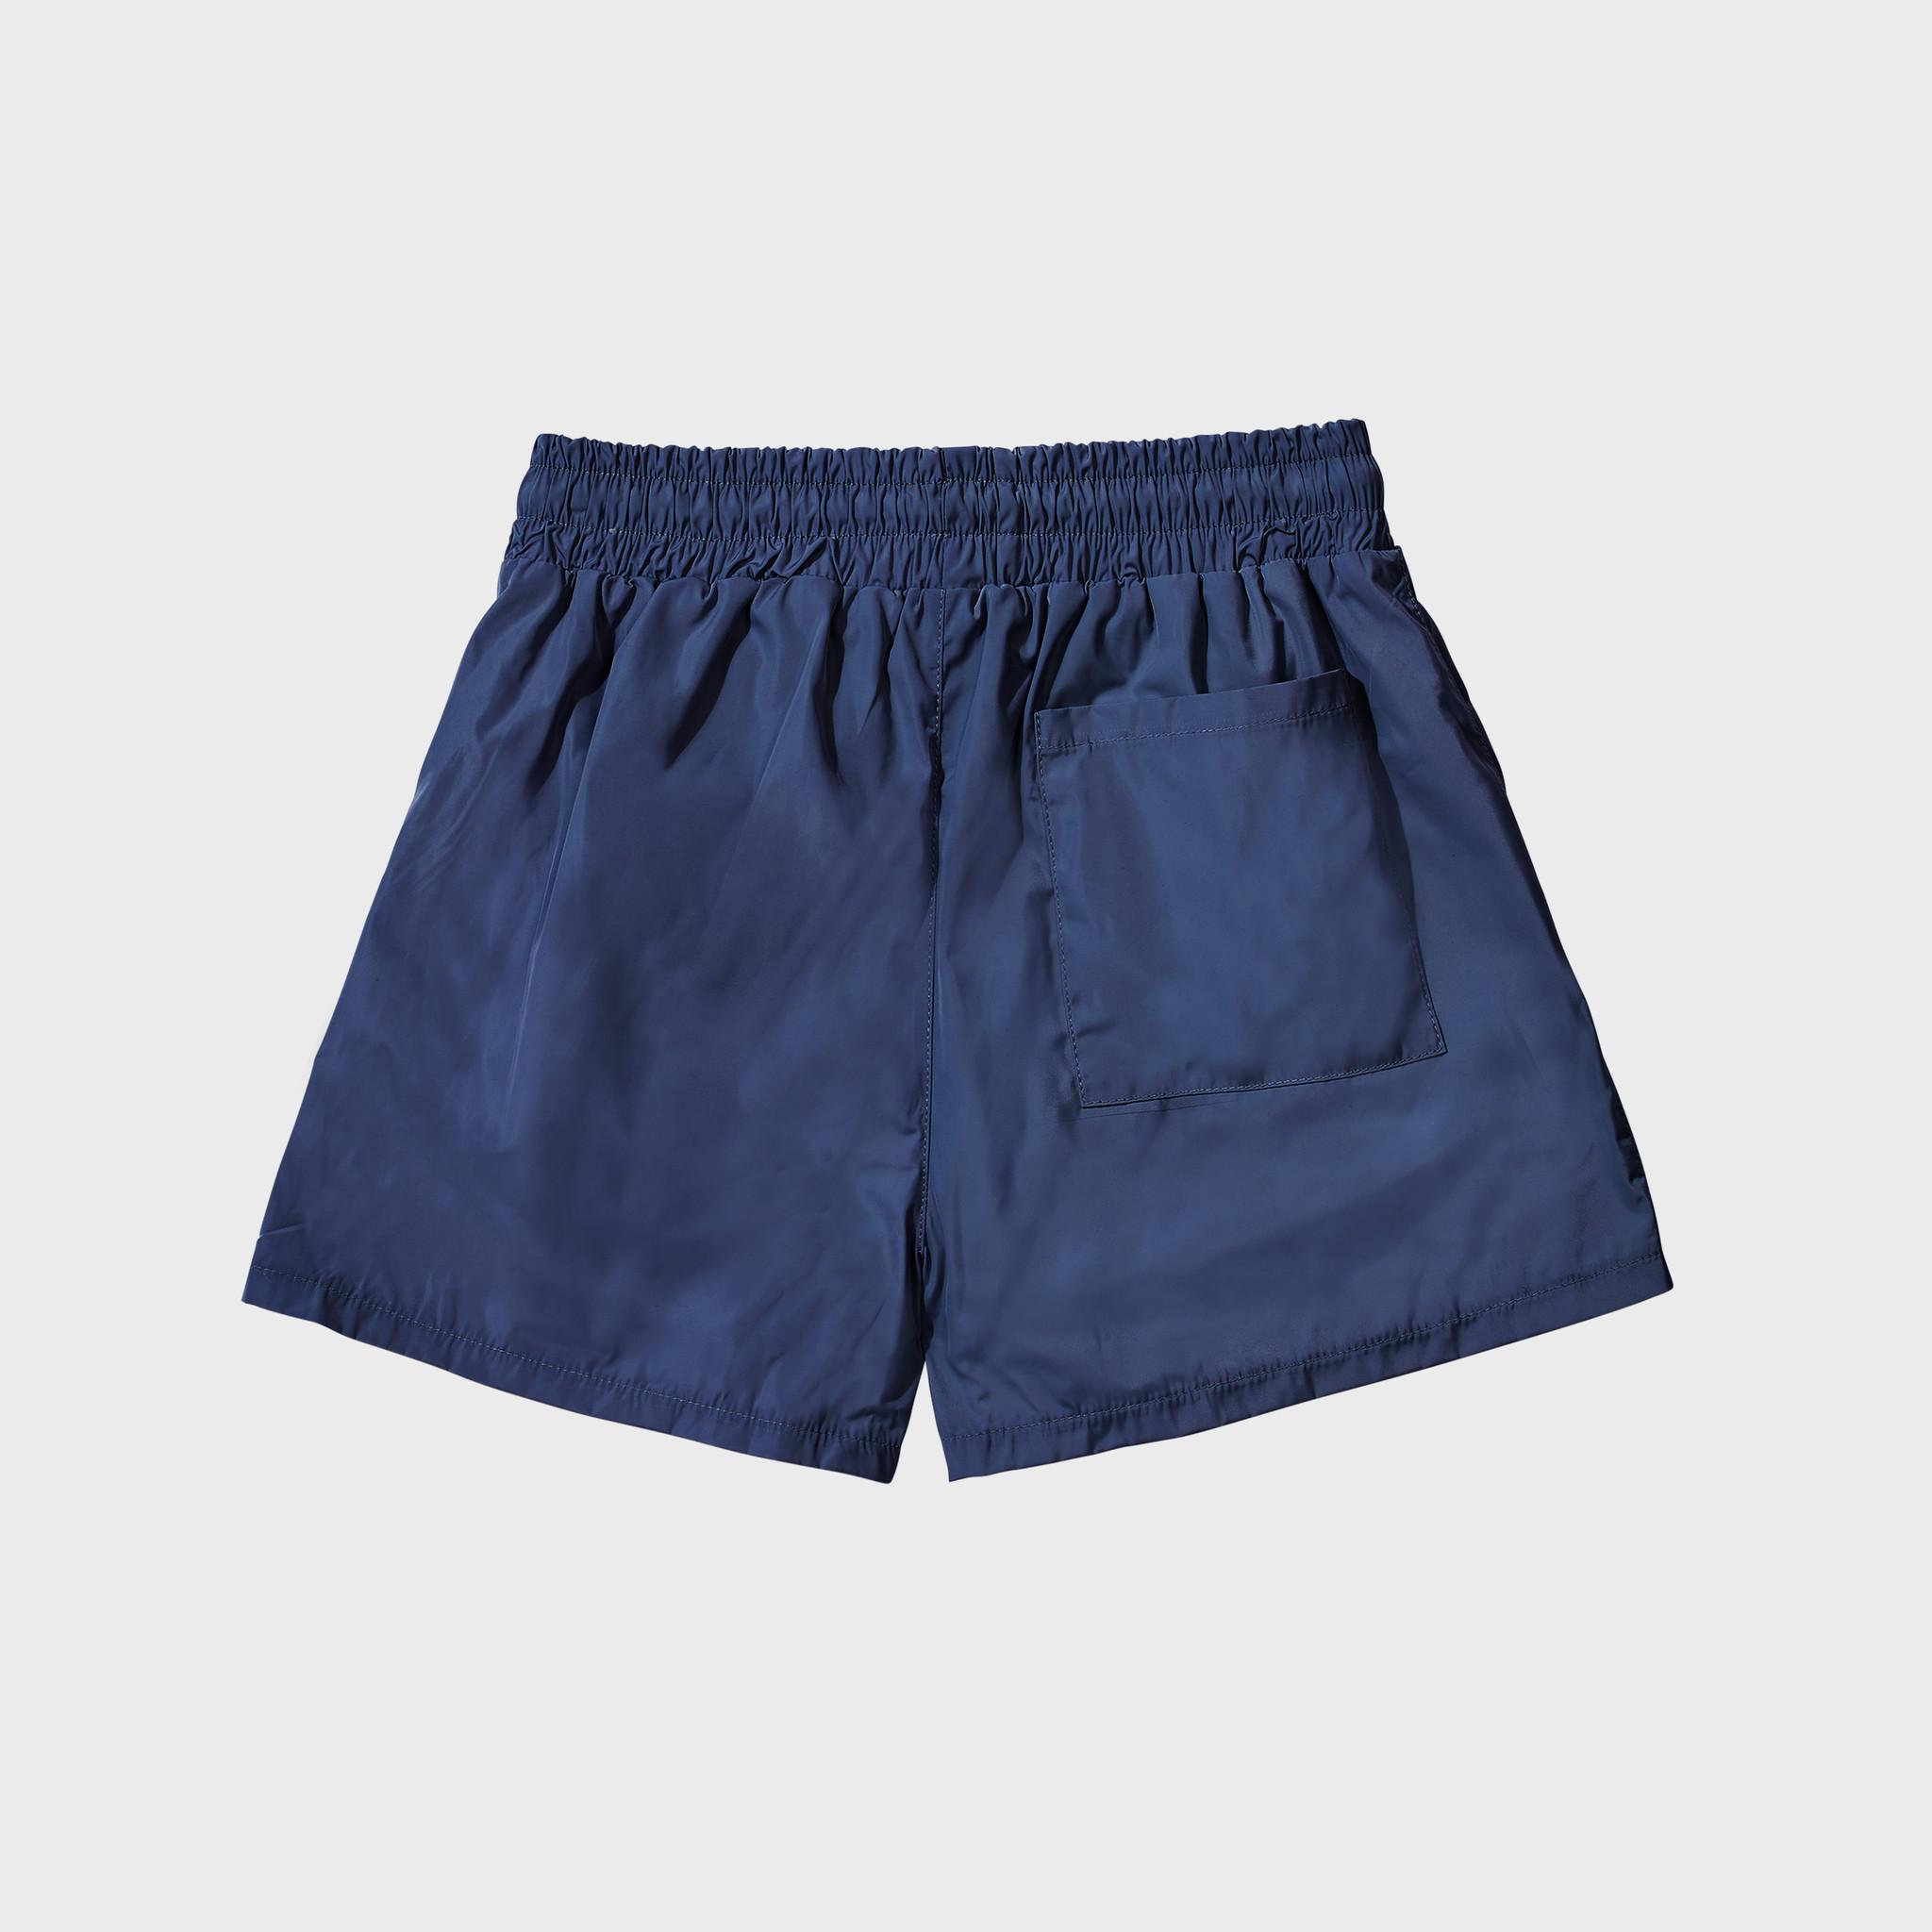 Amir swim shorts navy-2